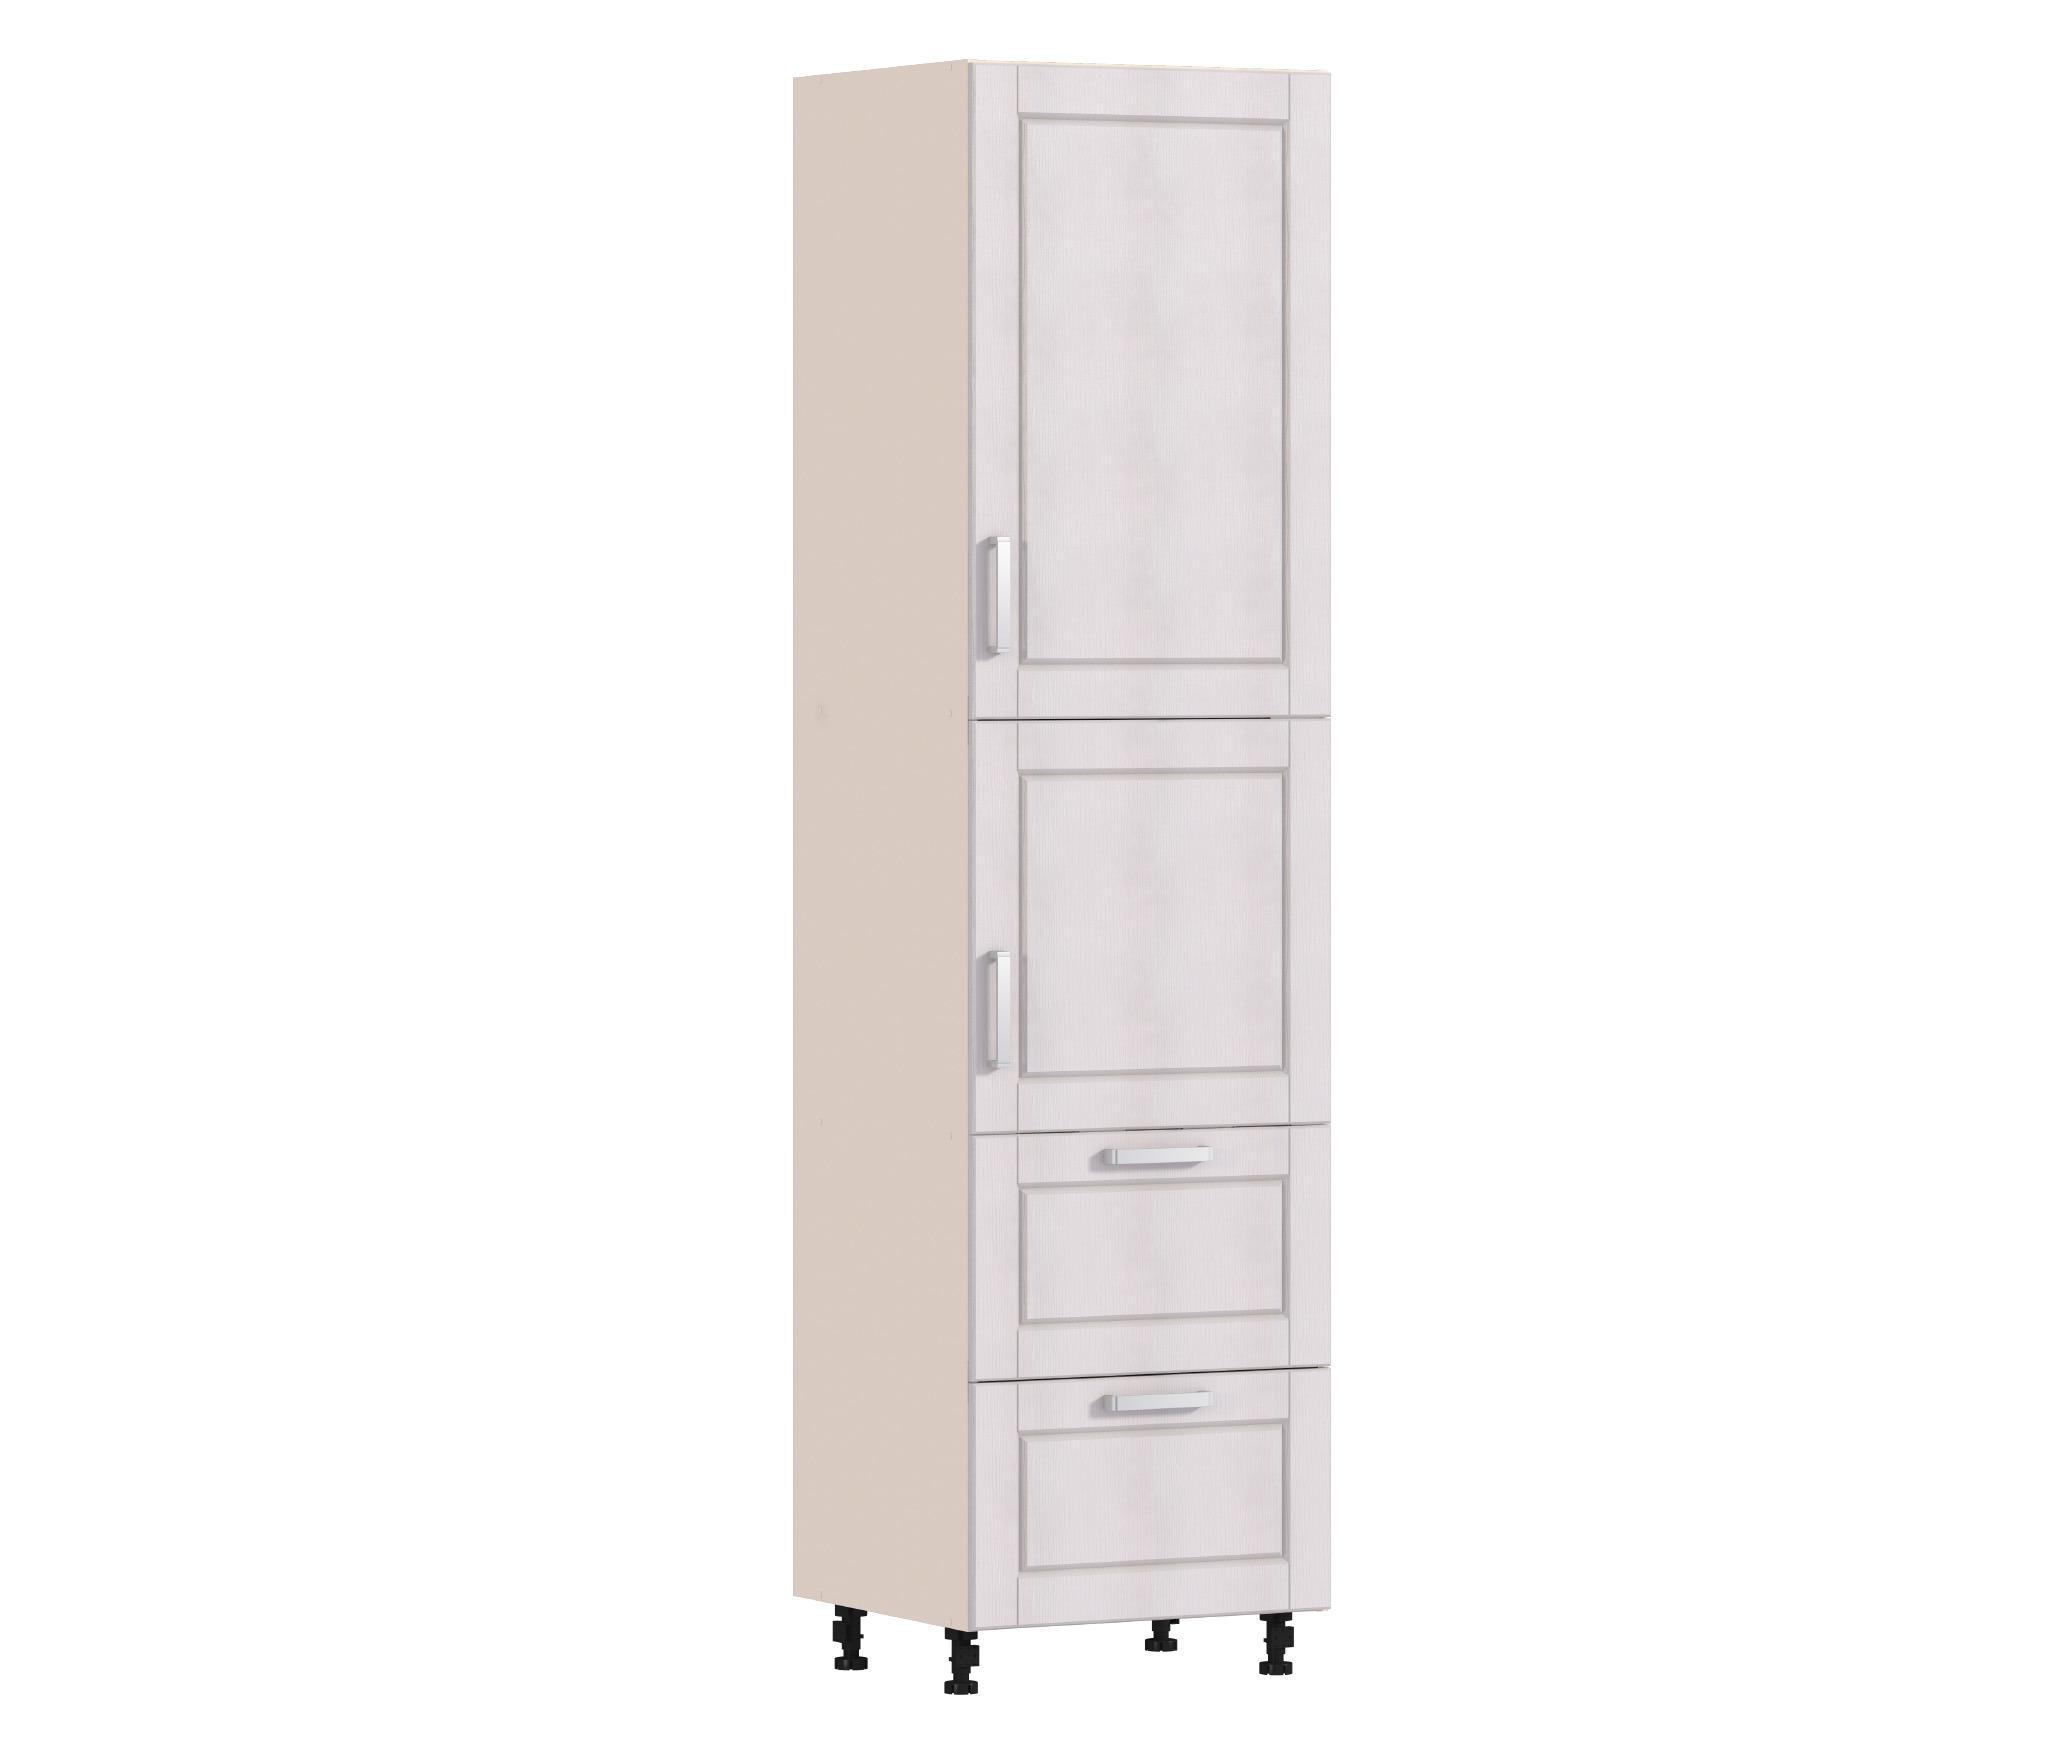 Регина РП-760 пеналМебель для кухни<br><br><br>Длина мм: 0<br>Высота мм: 0<br>Глубина мм: 0